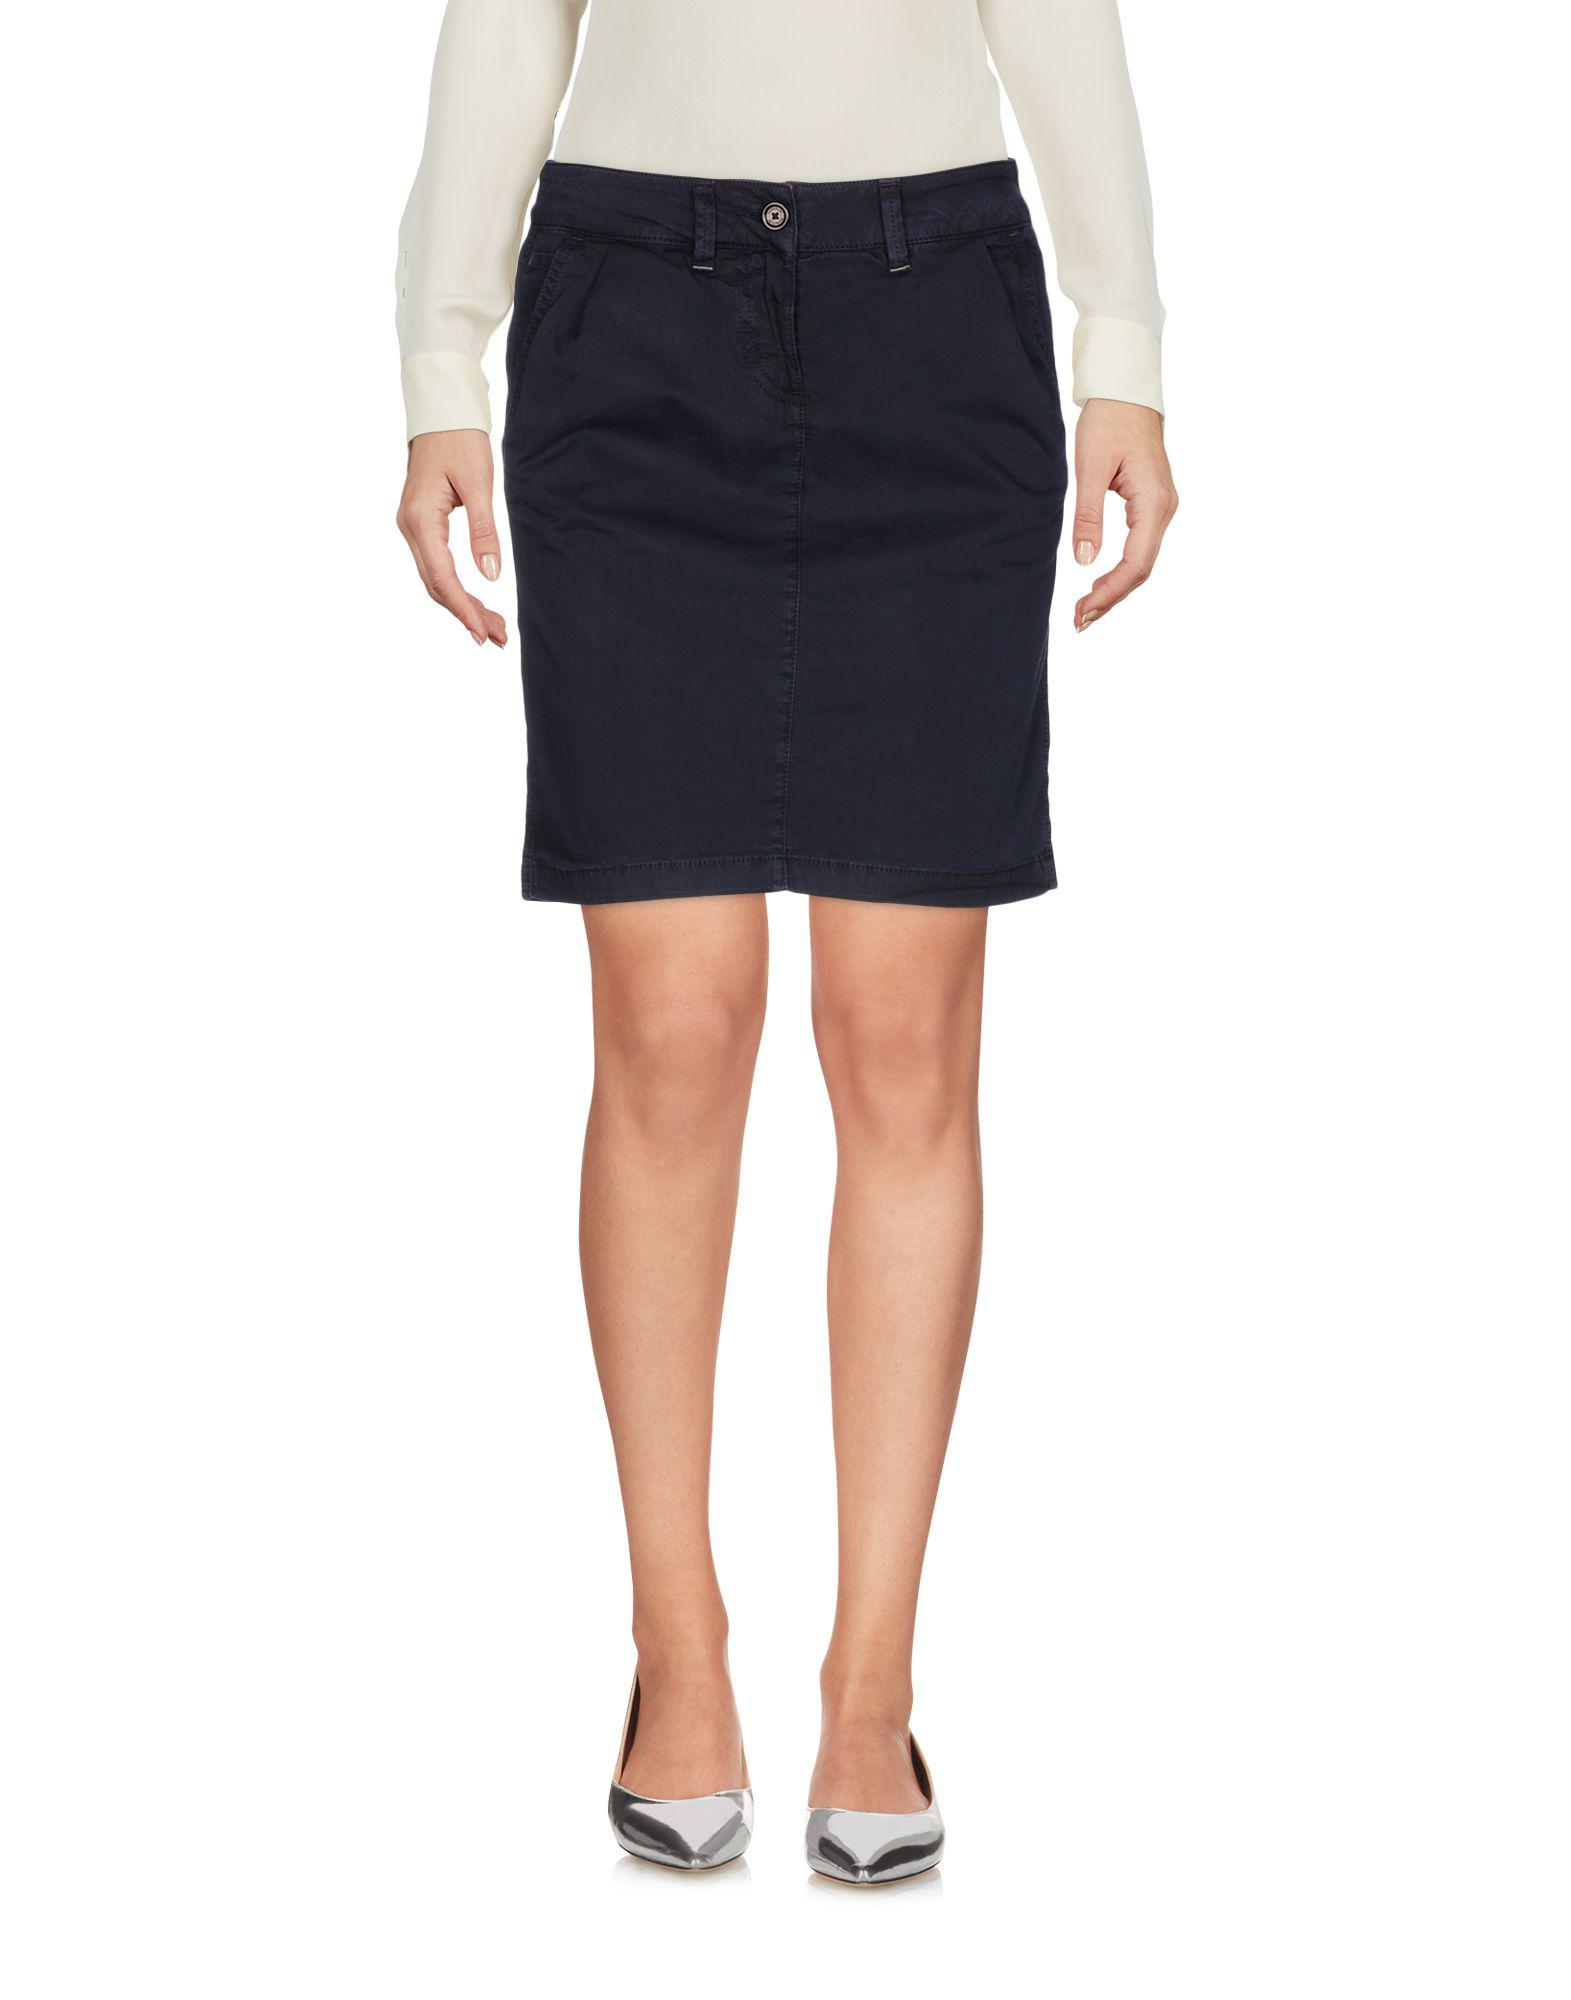 SKIRTS - Mini skirts Napapijri Free Shipping Cost Cheap Pay With Visa Nicekicks Sale Online MyjGtf